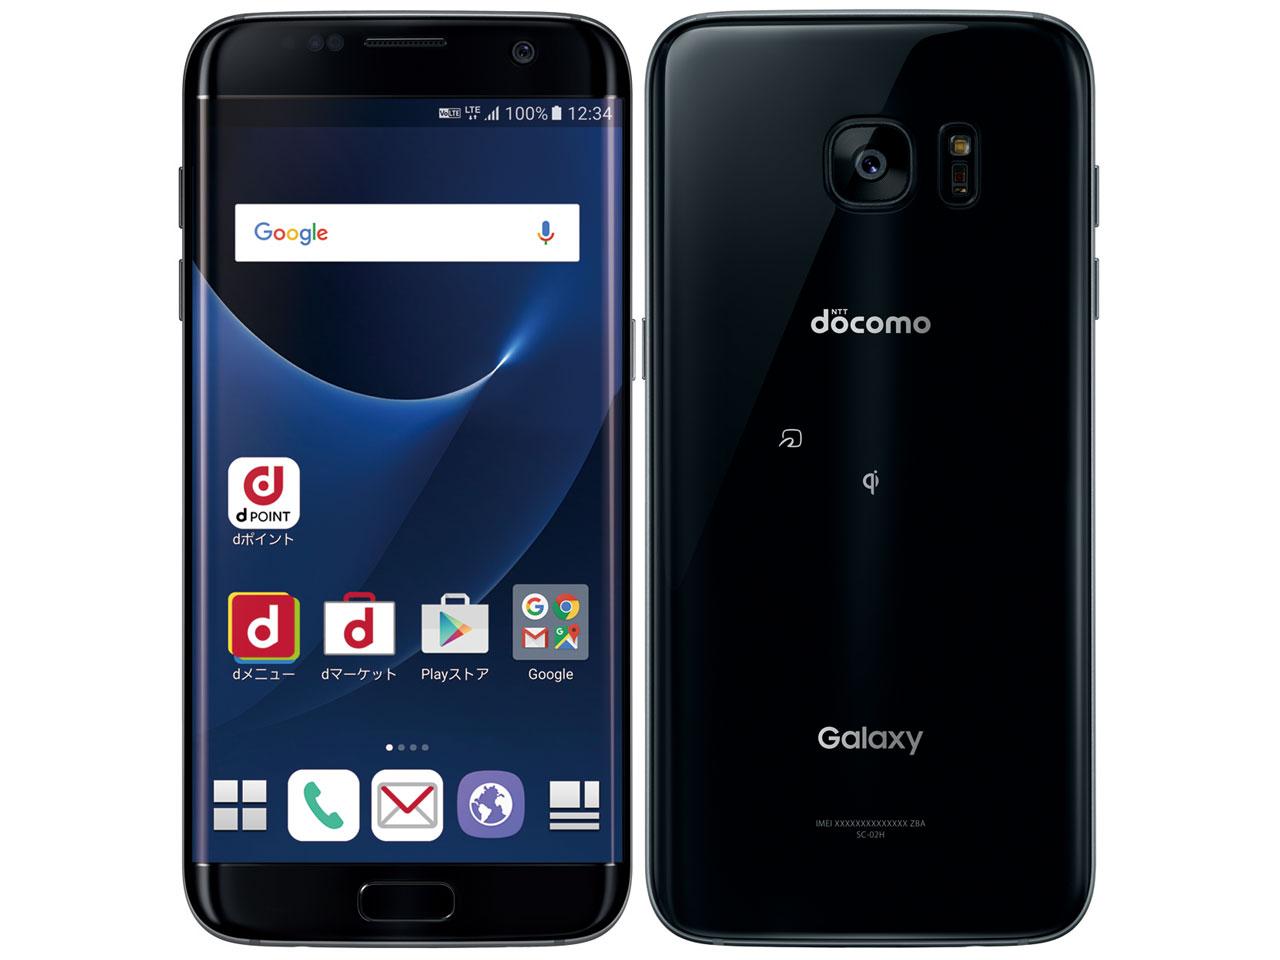 Galaxy S7 edge SC-02H docomo [Black Onyx] の製品画像